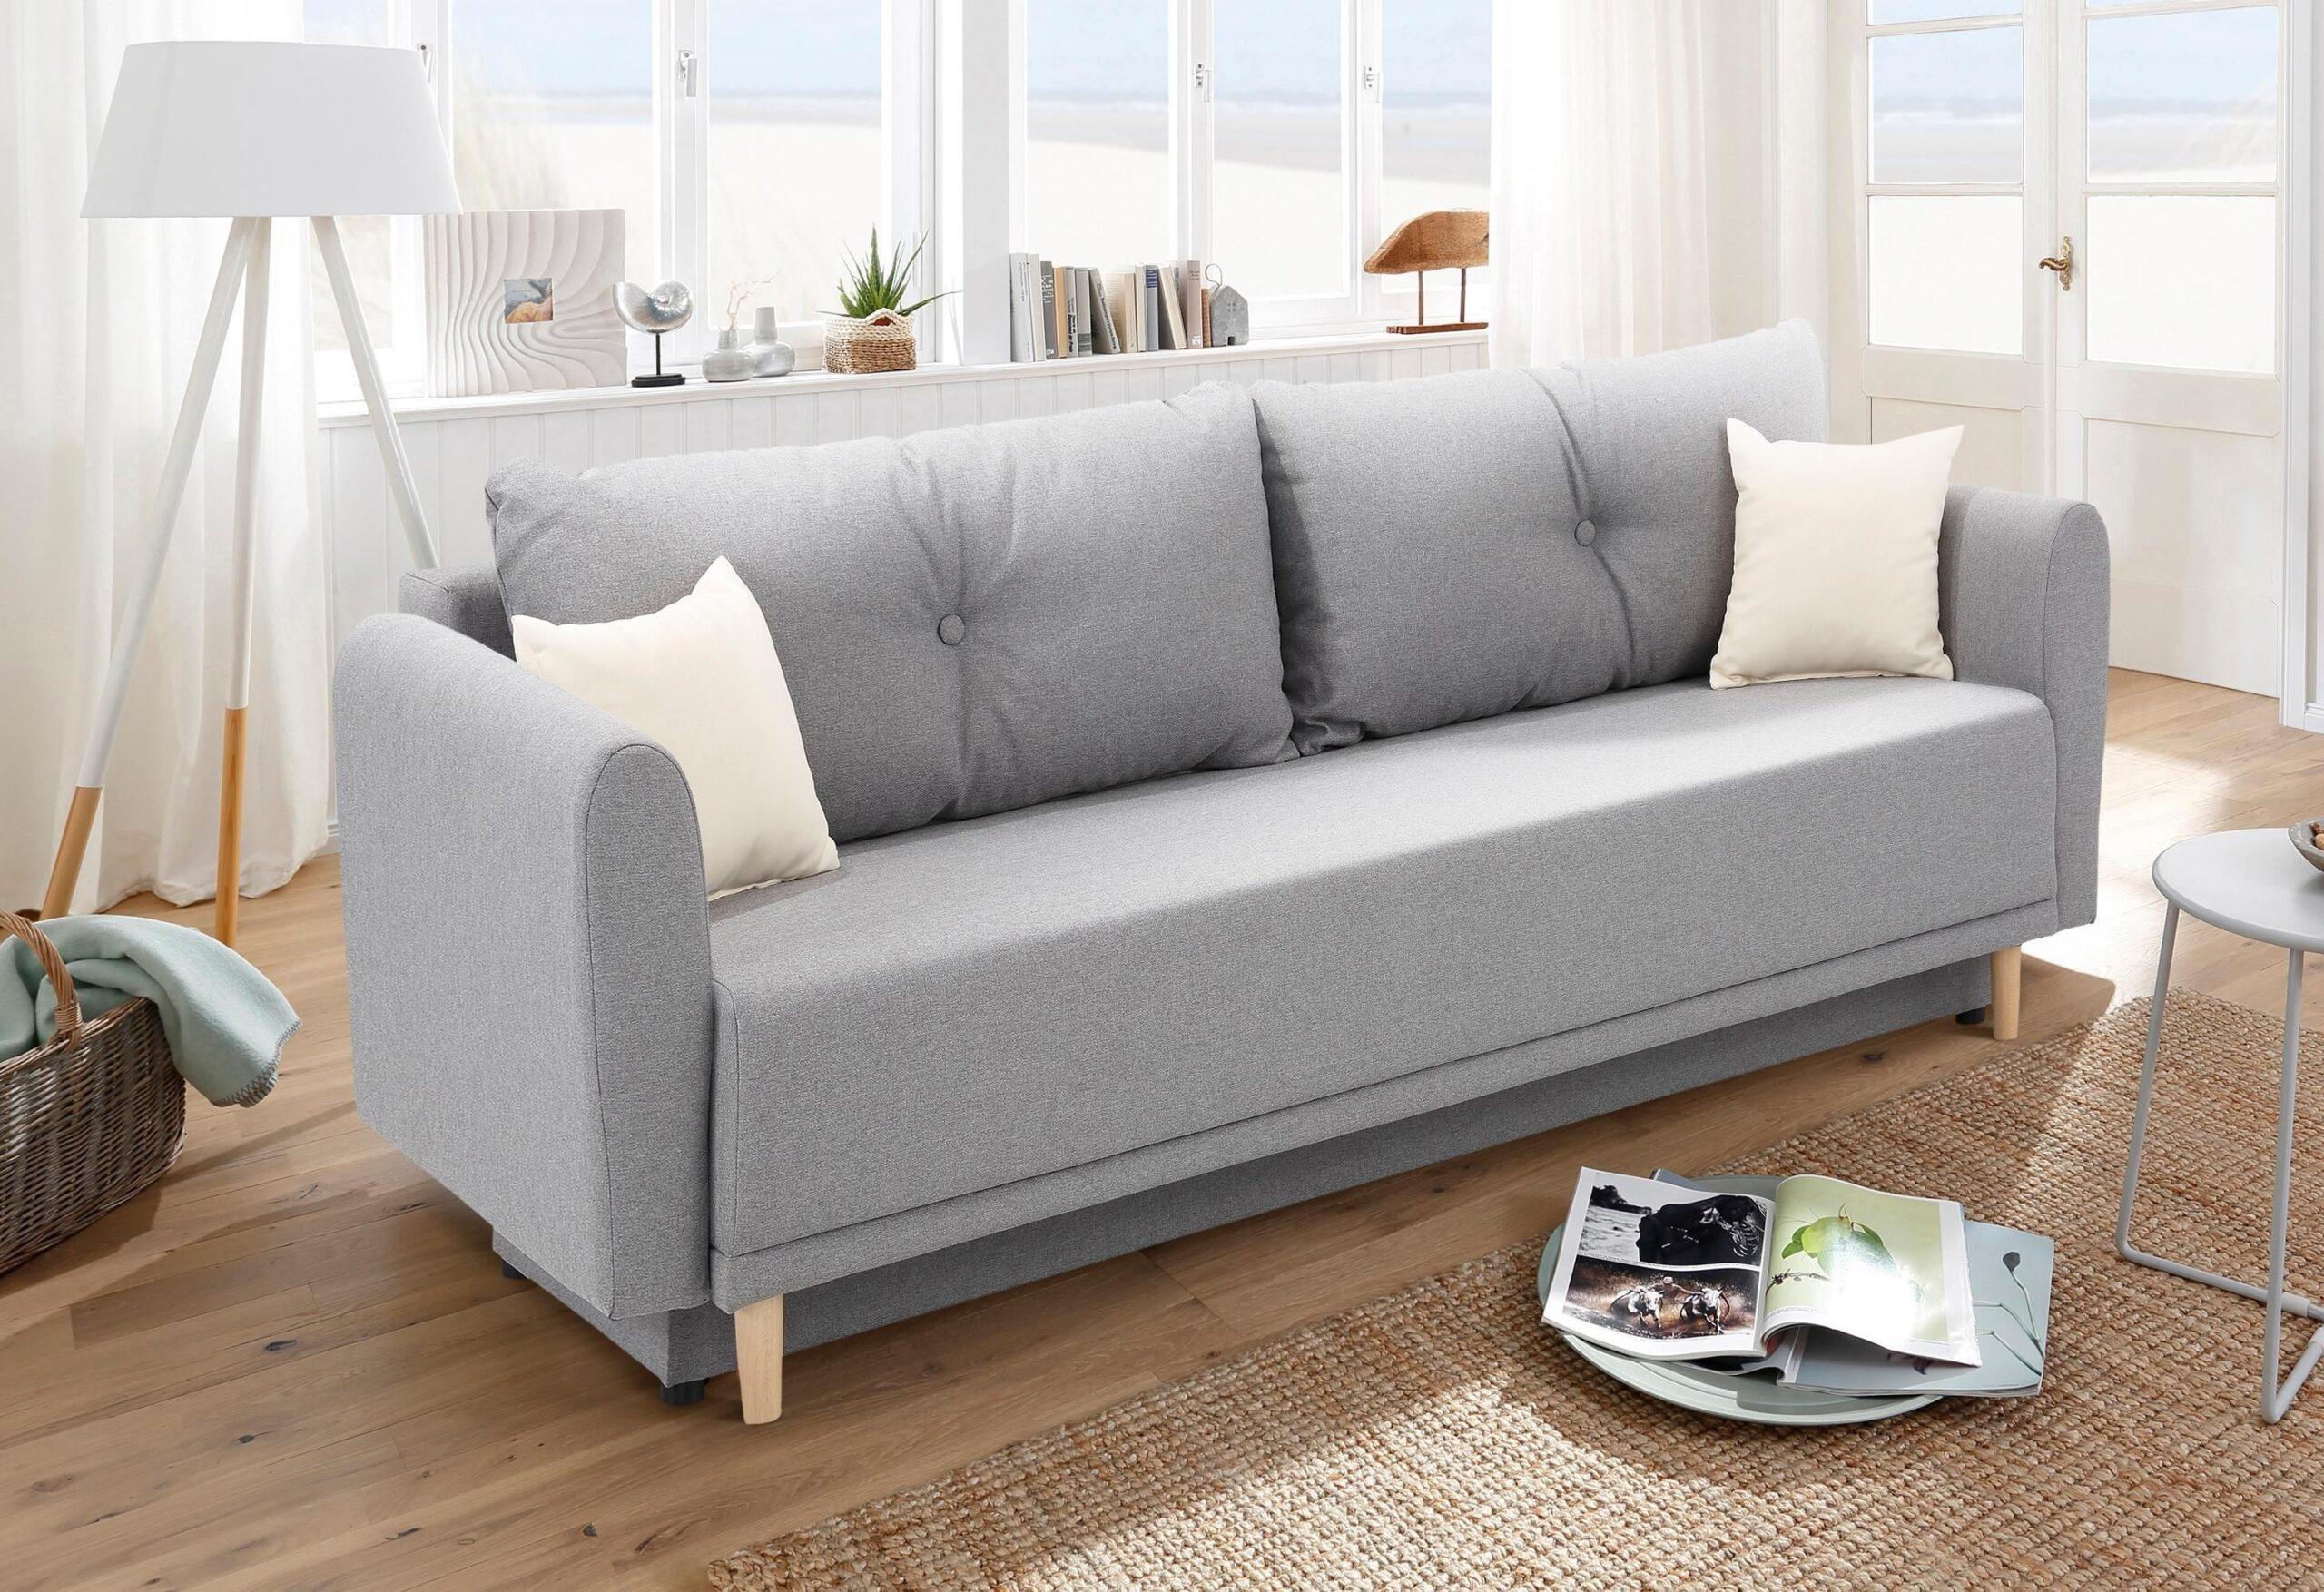 Full Size of Weißes Sofa Weies Gnstig Cheap Big Couch Pillows Gnstige Alcantara Stoff Grau Bullfrog Federkern Großes Luxus Relaxfunktion Lederpflege Alternatives Mit Sofa Weißes Sofa